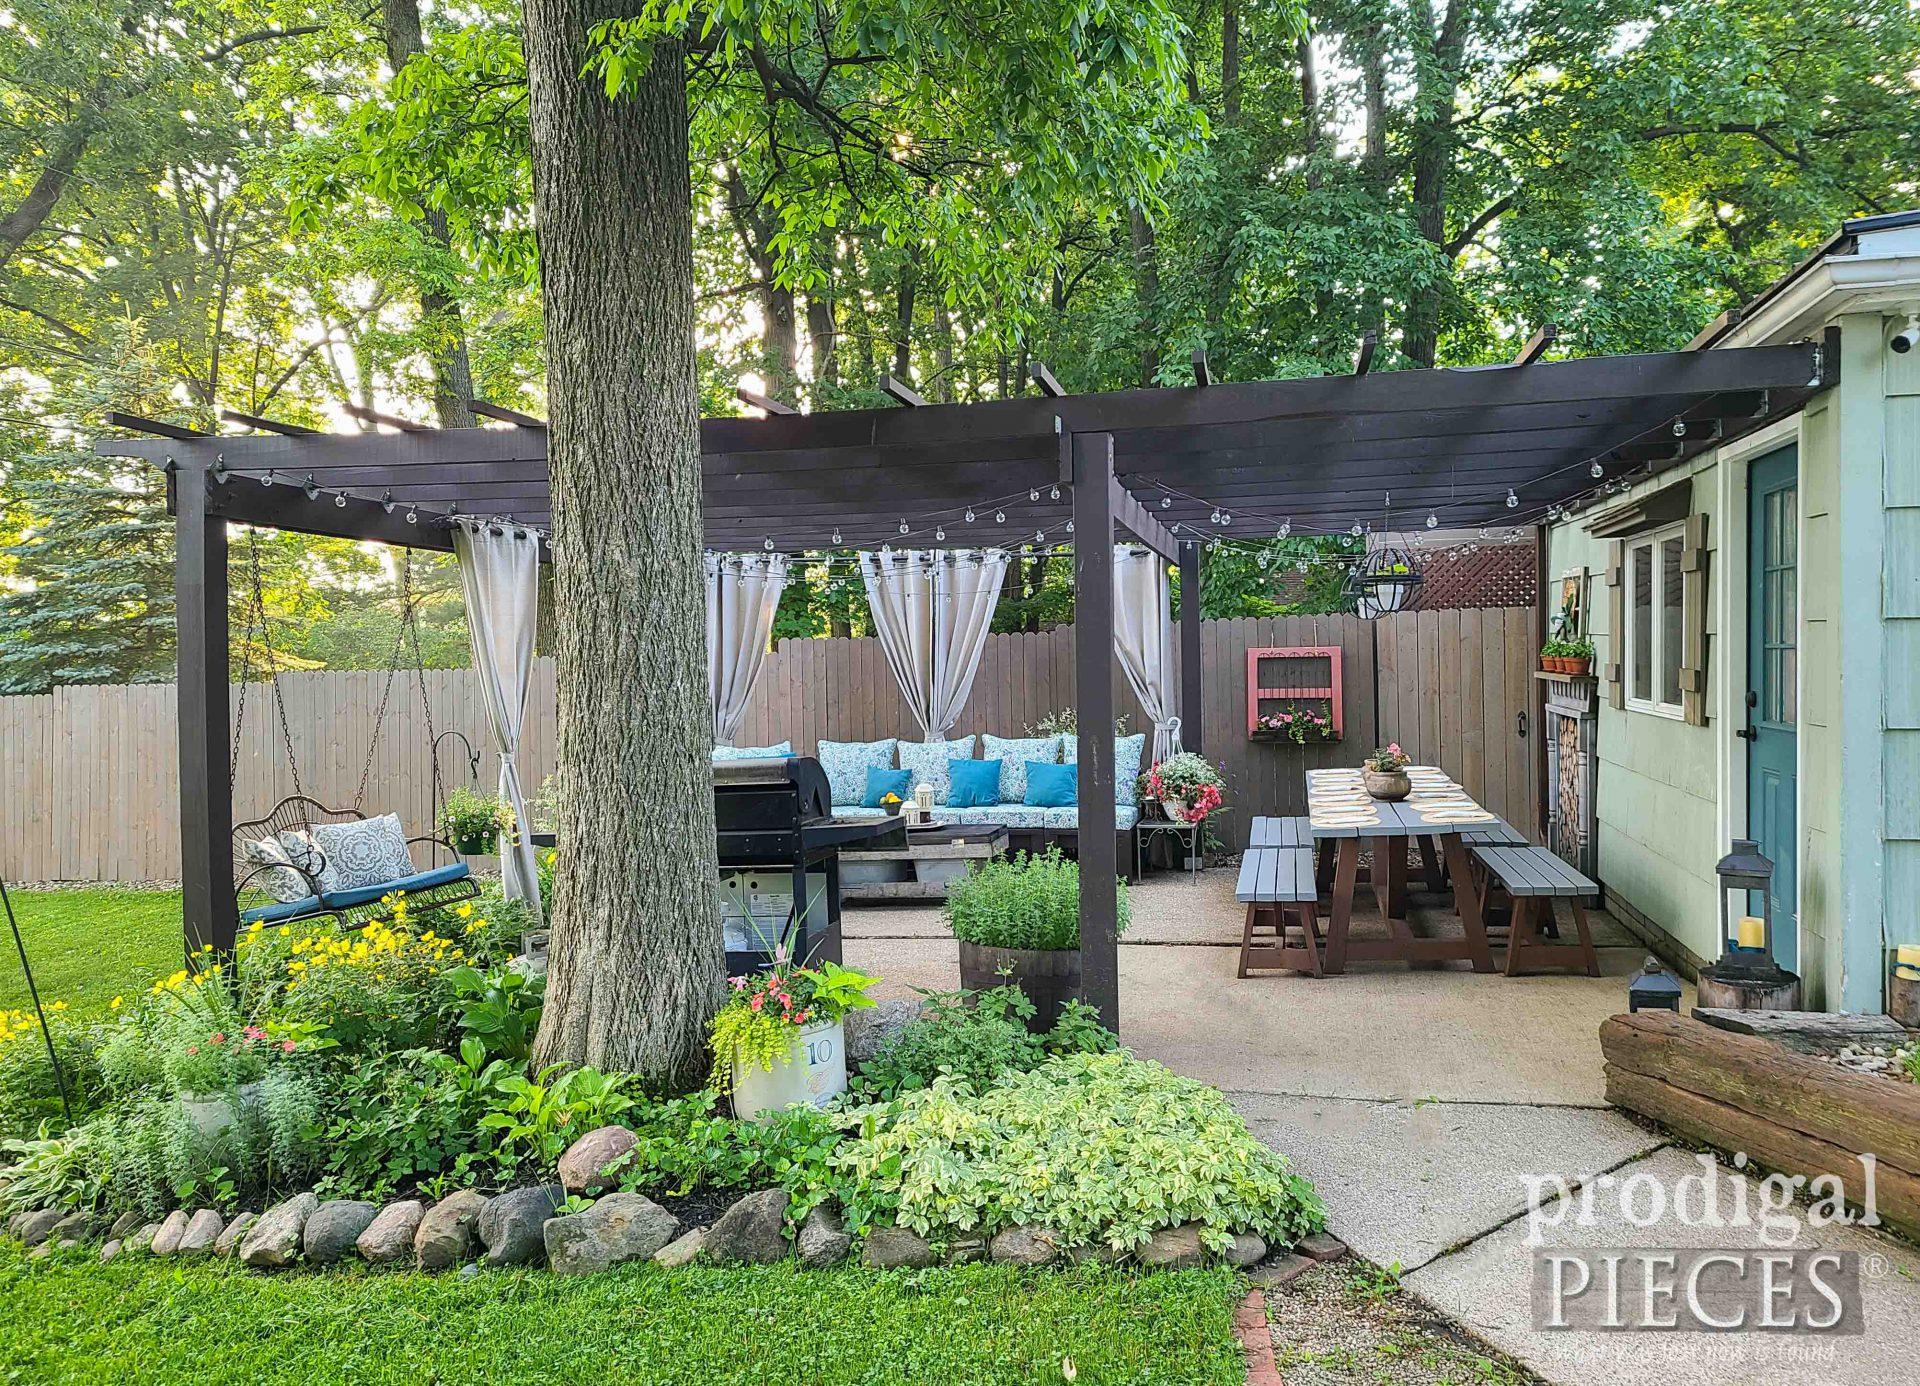 Farmhouse Style Patio with DIY Pergola by Larissa of Prodigal Pieces | prodigalpieces.com #prodigalpieces #diy #patio #pergola